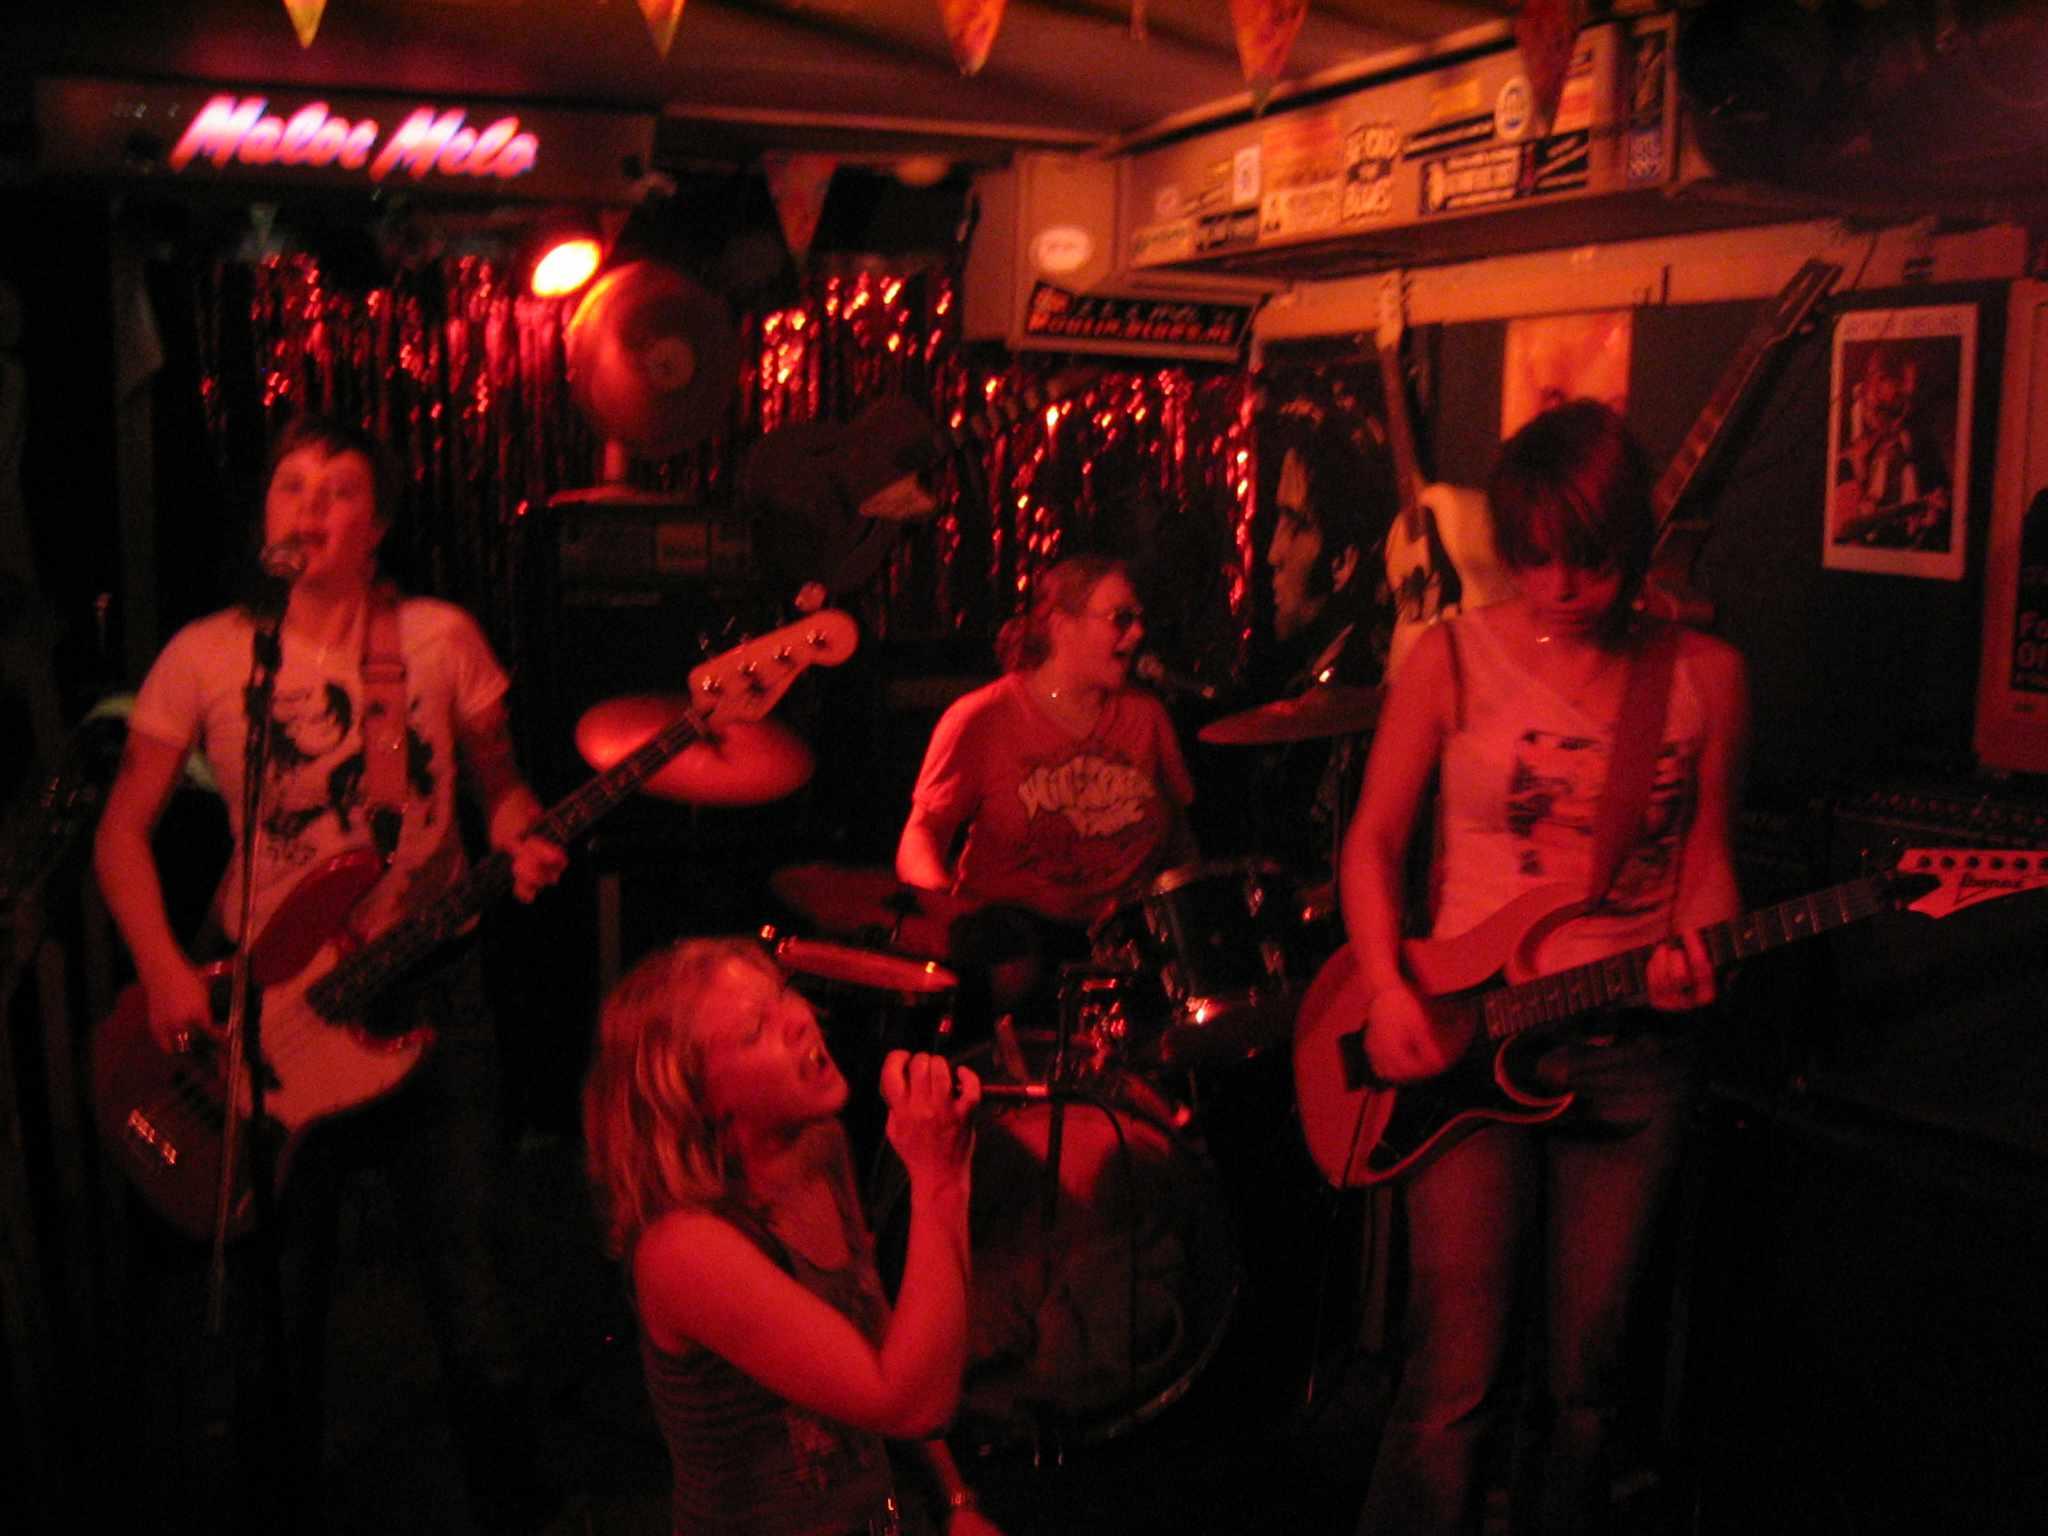 A band performs at Maloe Melo